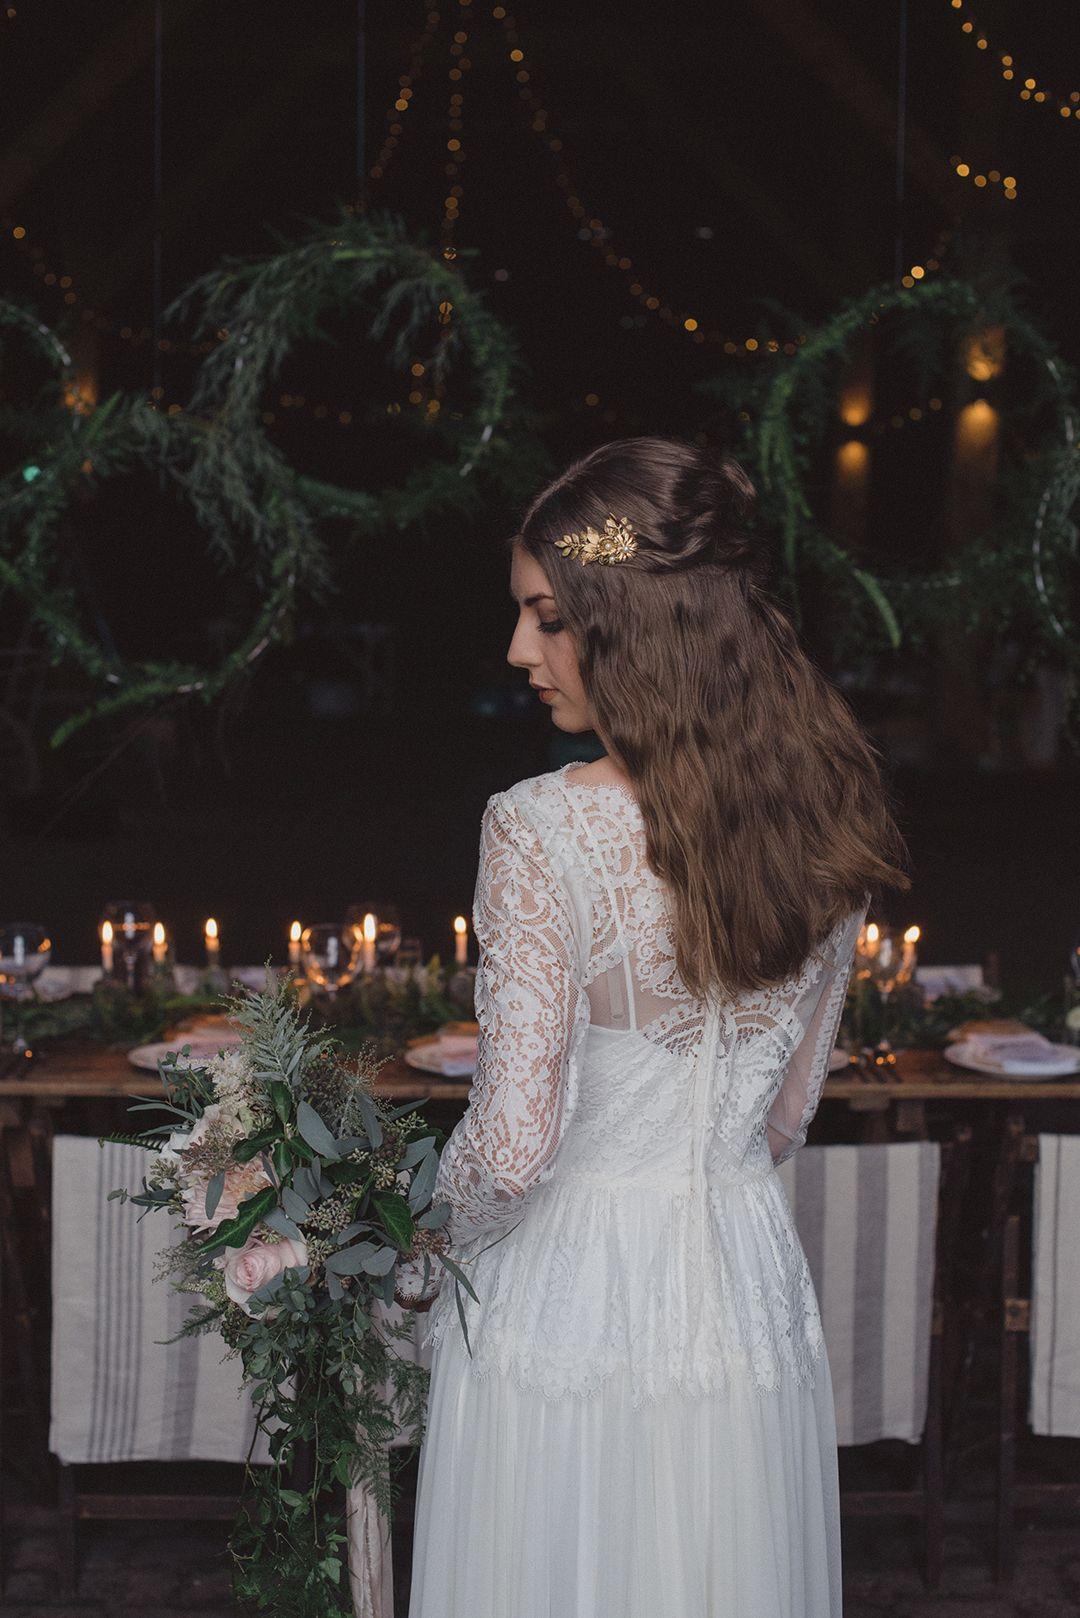 Winter Wedding Inspiration Wild Romance in